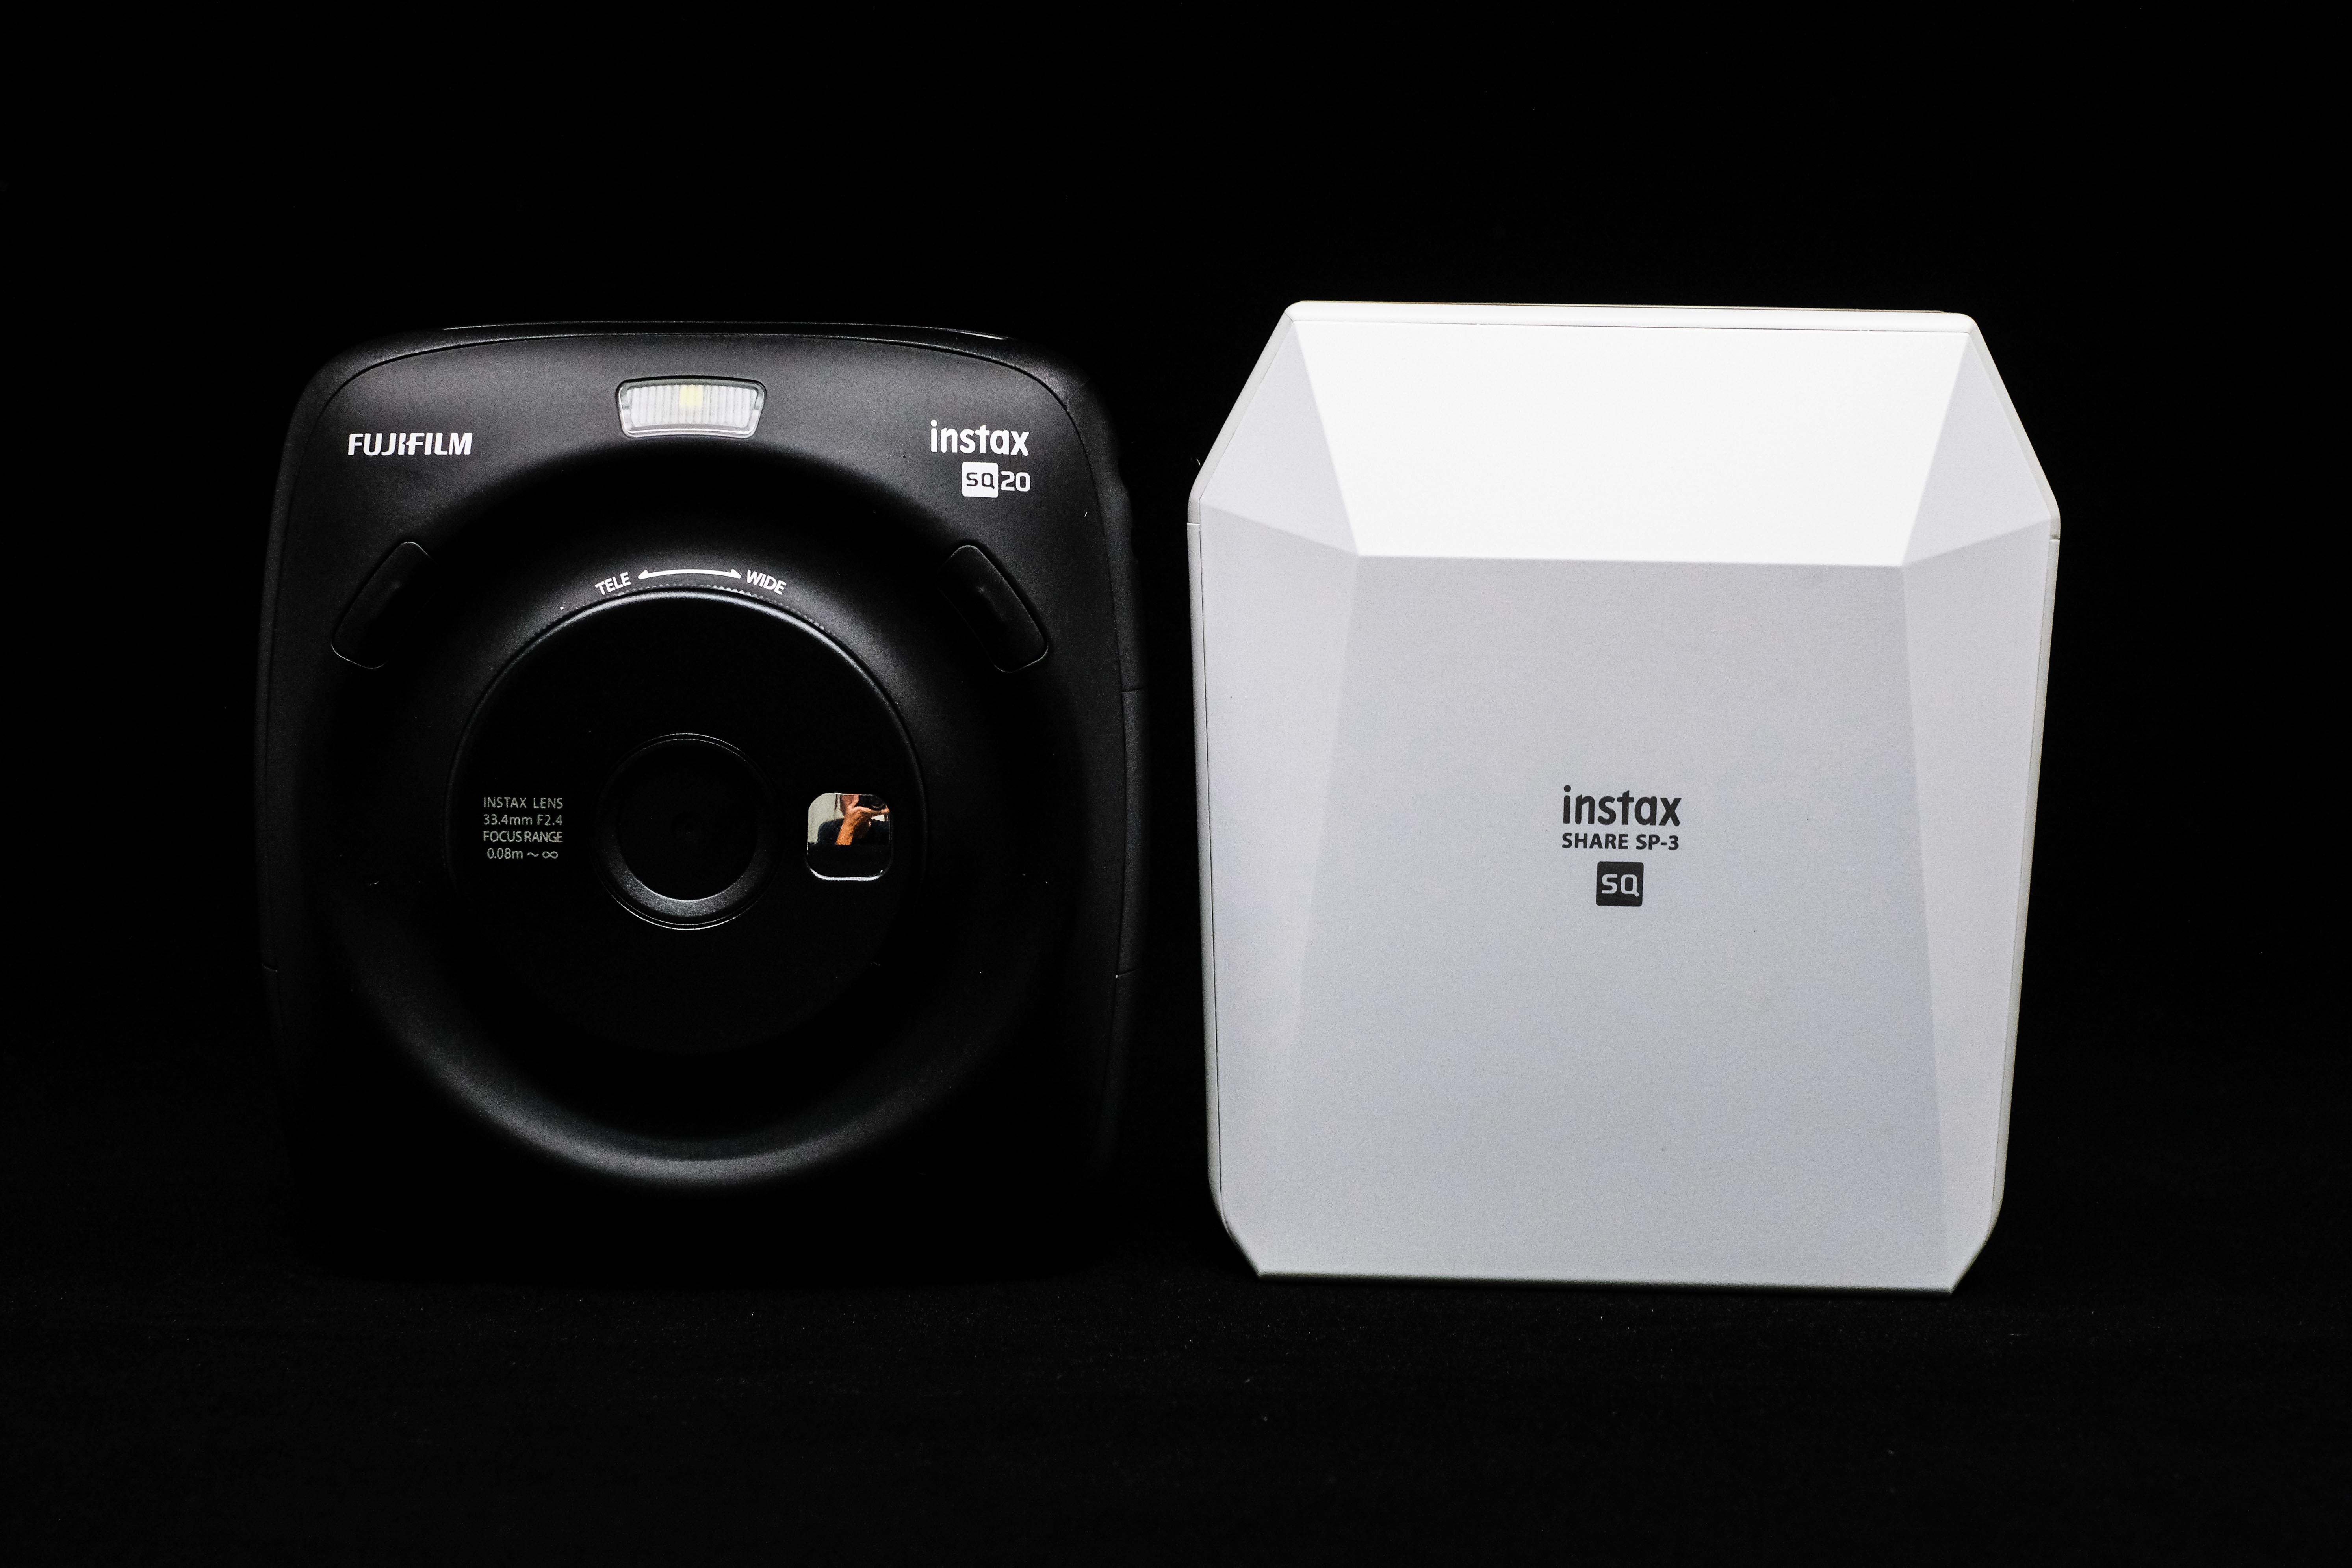 Fixed Lens Camera Fujifilm X T100 Body Xf35mm F2 Gold Kamera Mirrorless Back Of The